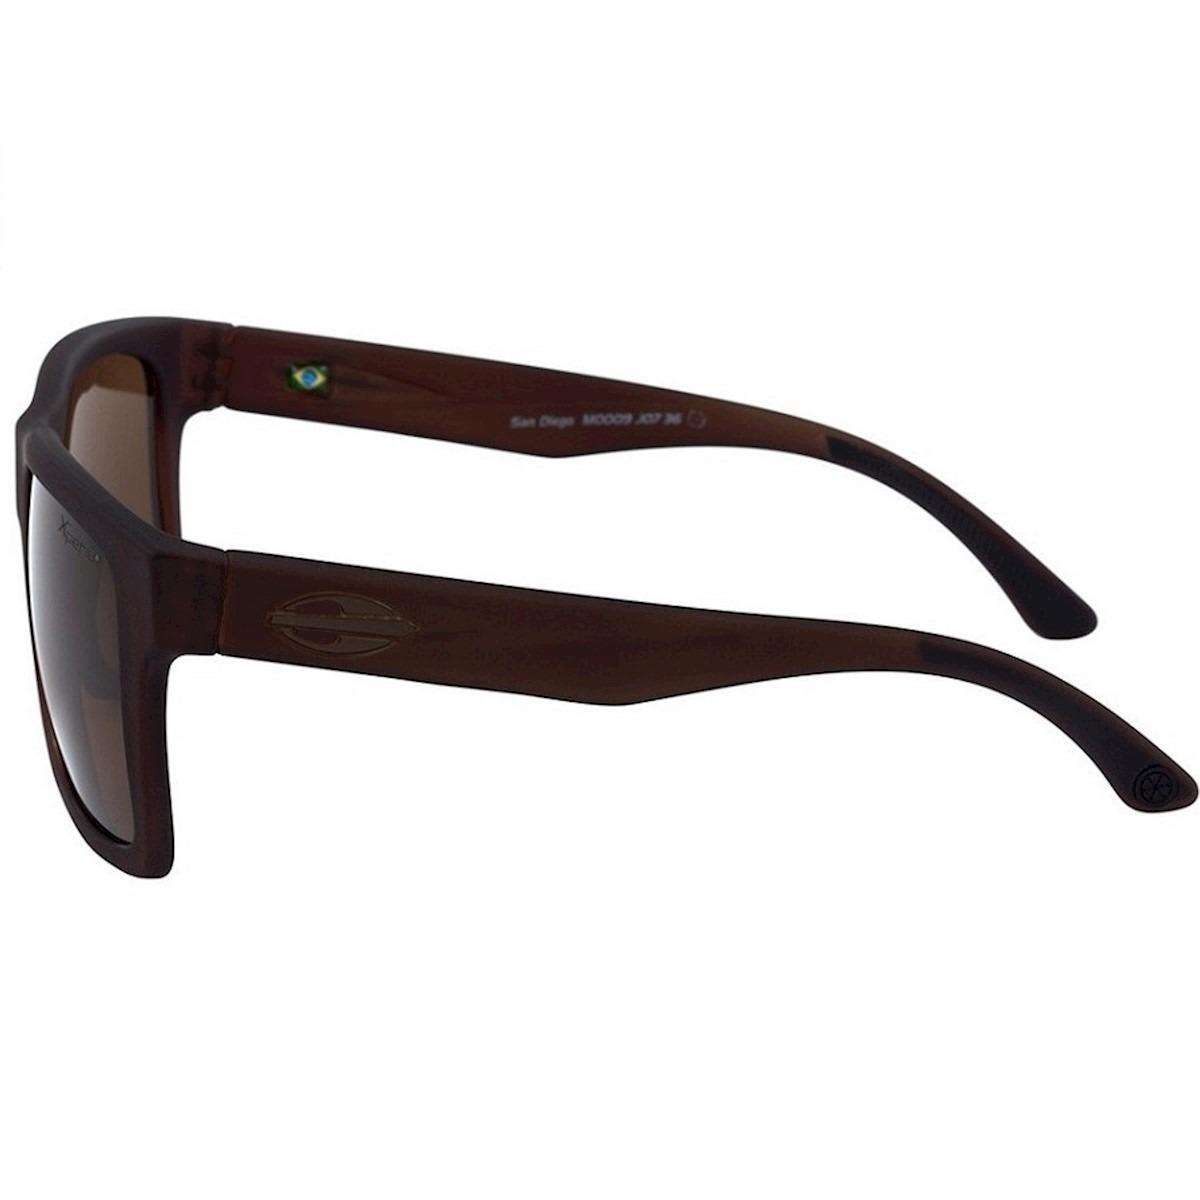 21780e1e6fc1d óculos de sol mormaii san diego polarizado marrom fosco tran. Carregando  zoom.